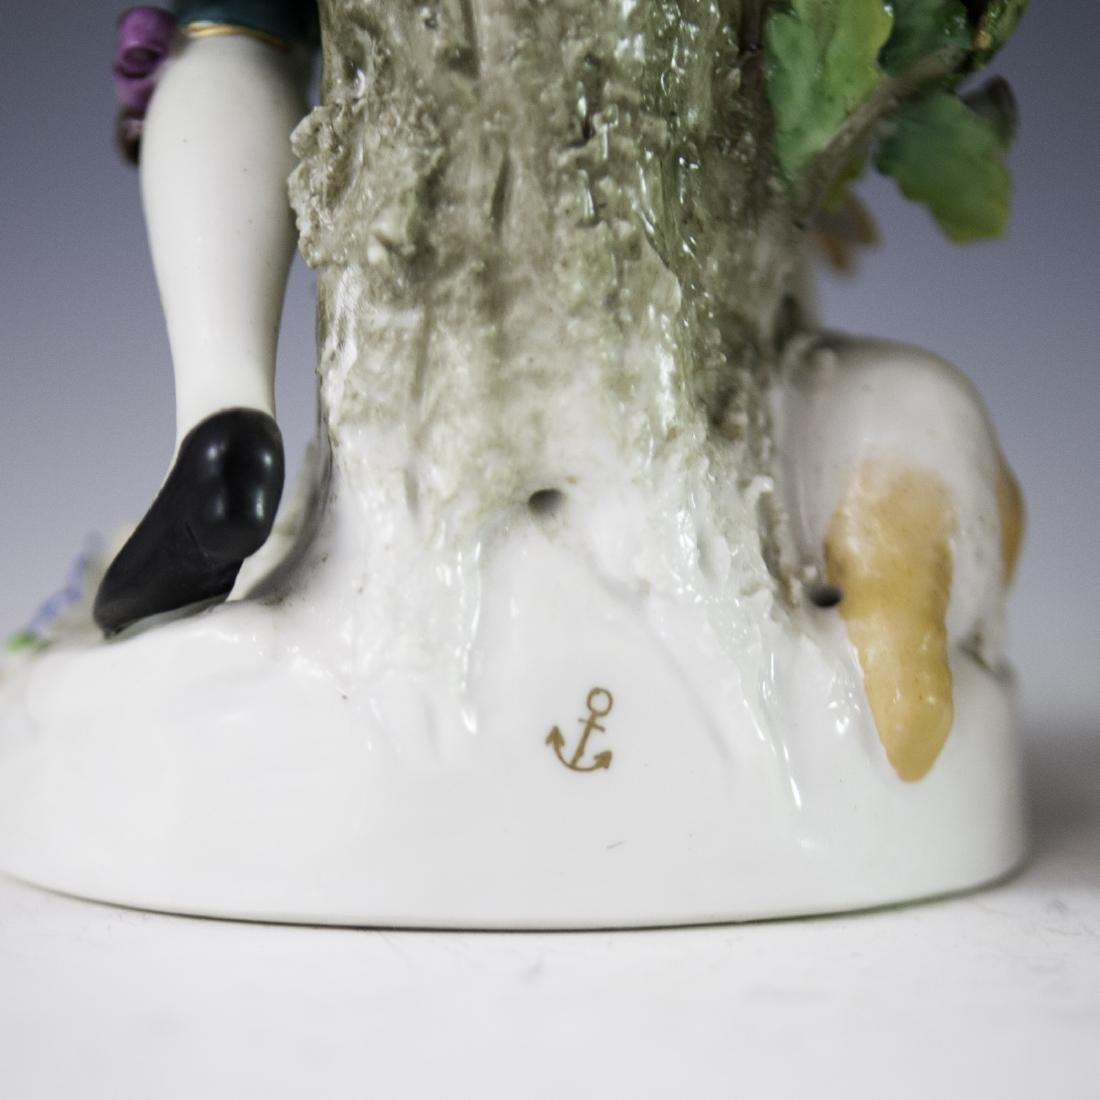 Chelsea Style Porcelain Figurines - 2